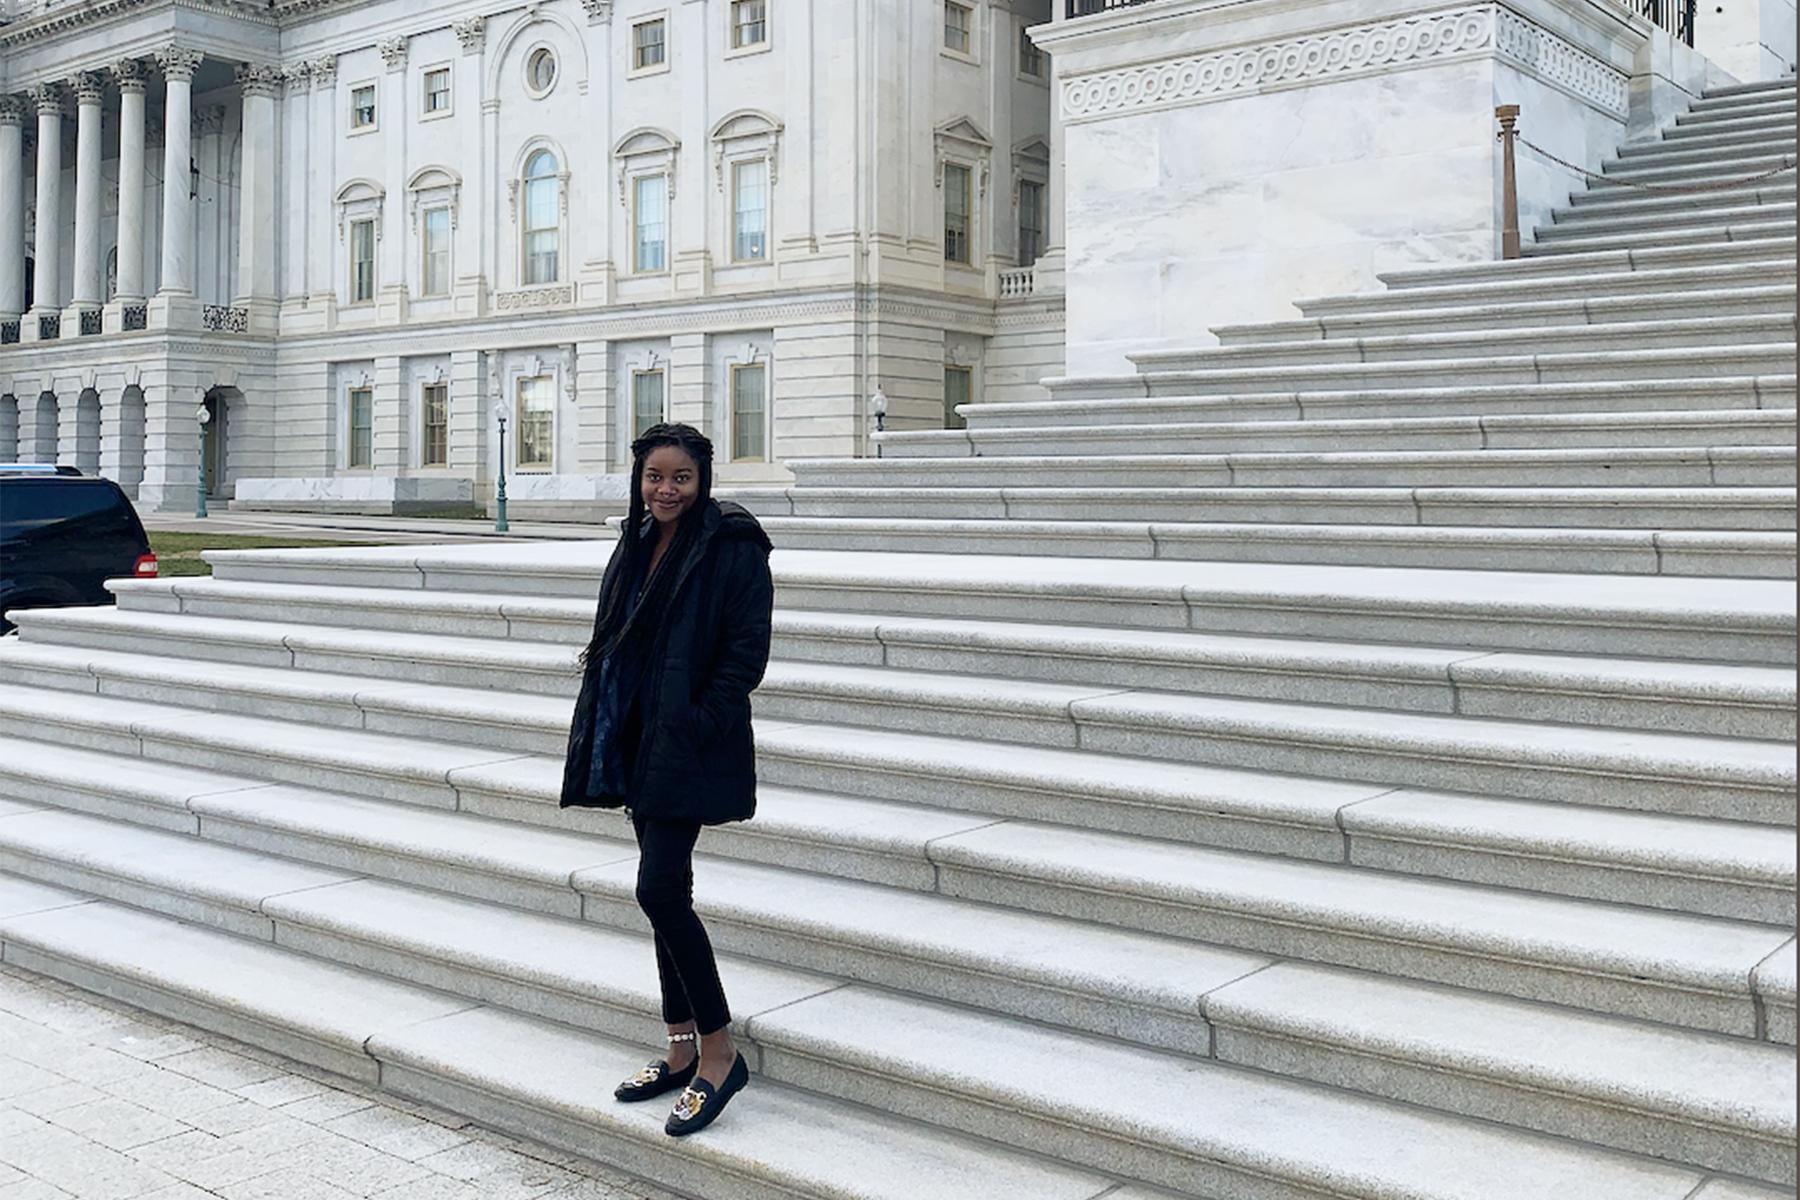 Penn junior Chinaza Ruth Okonkwo named a Beinecke Scholar